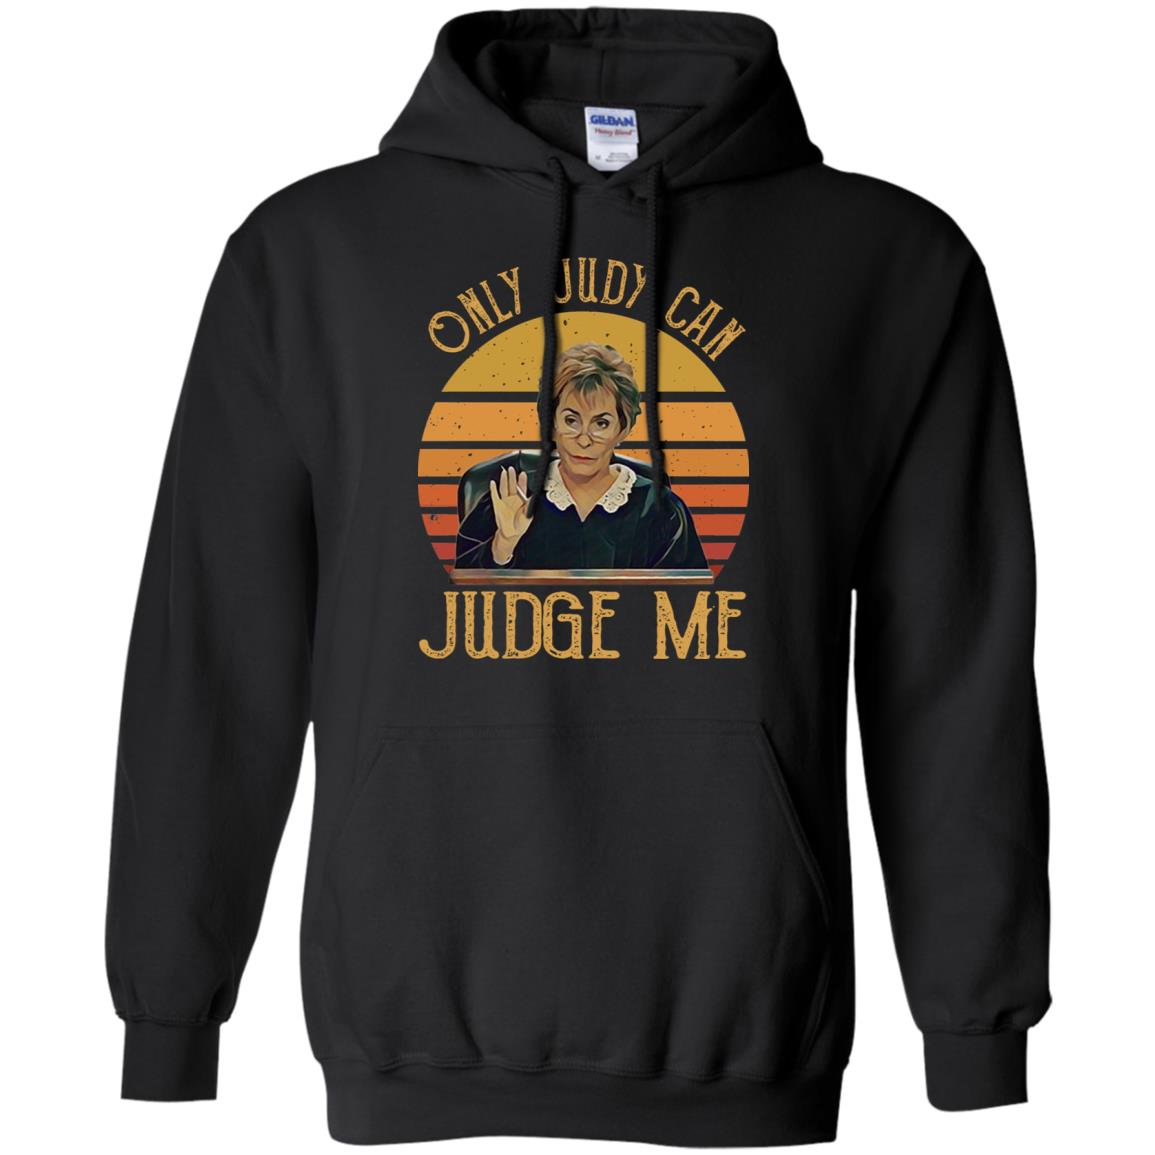 3d3ef831b Judy Sheindlin Only Judy can Judge me vintage hoodie, t shirt ...